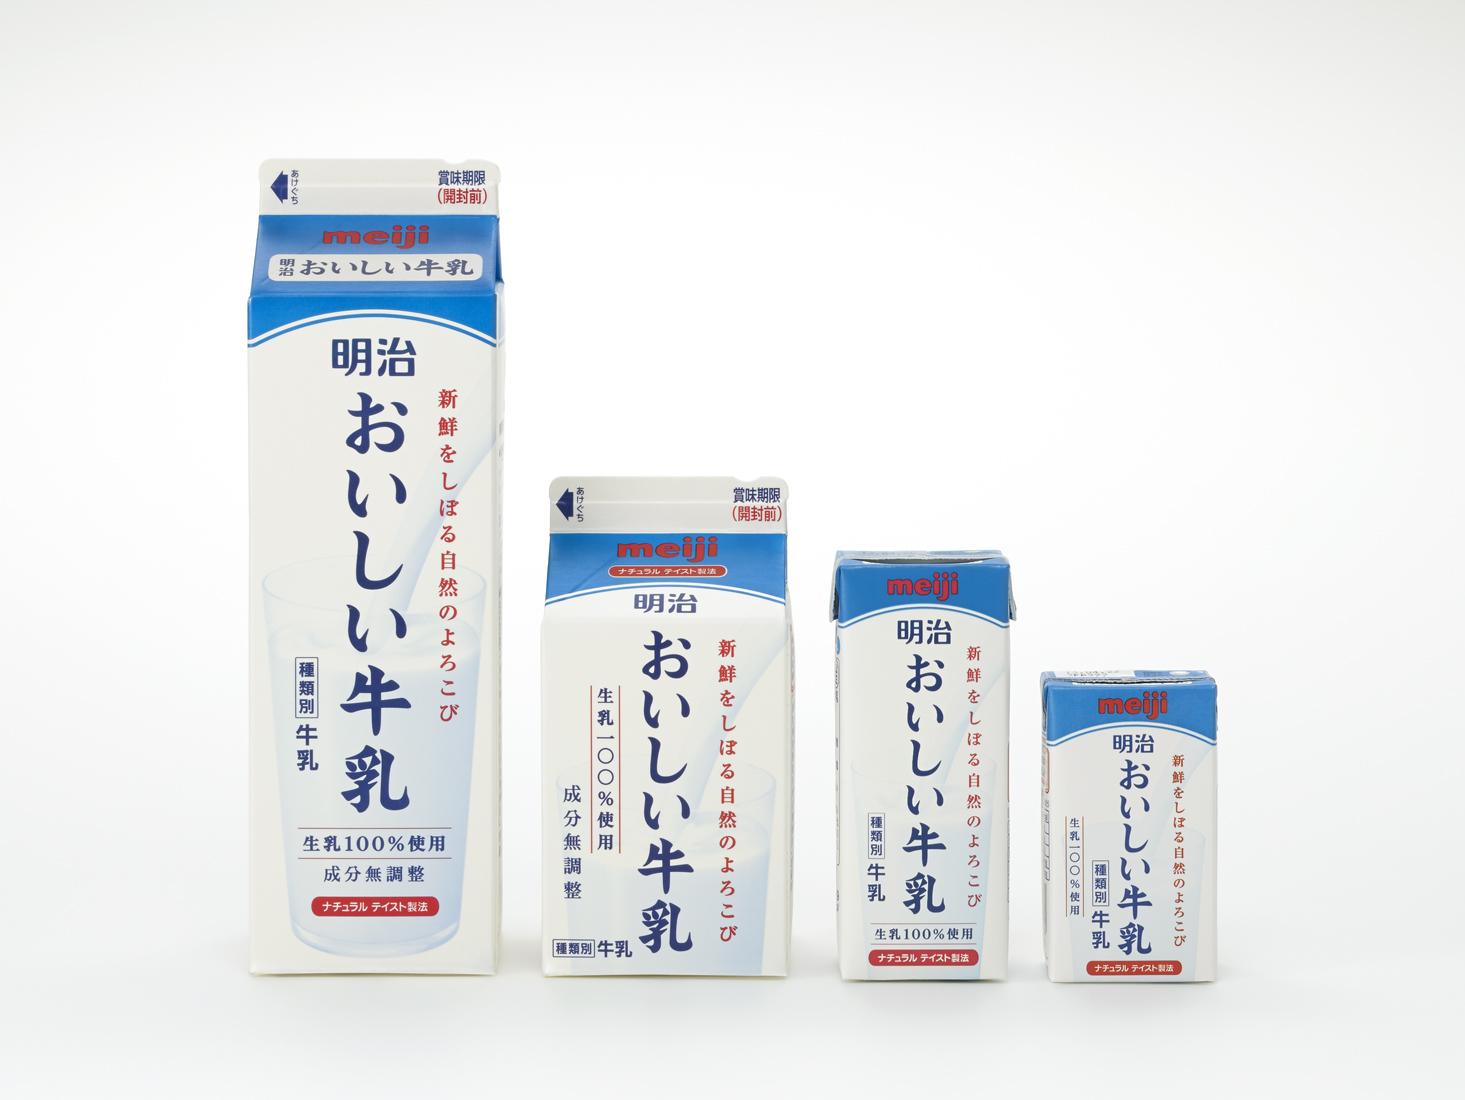 http://www.tsdo.jp/images/portfolio/meiji_04_2.jpg